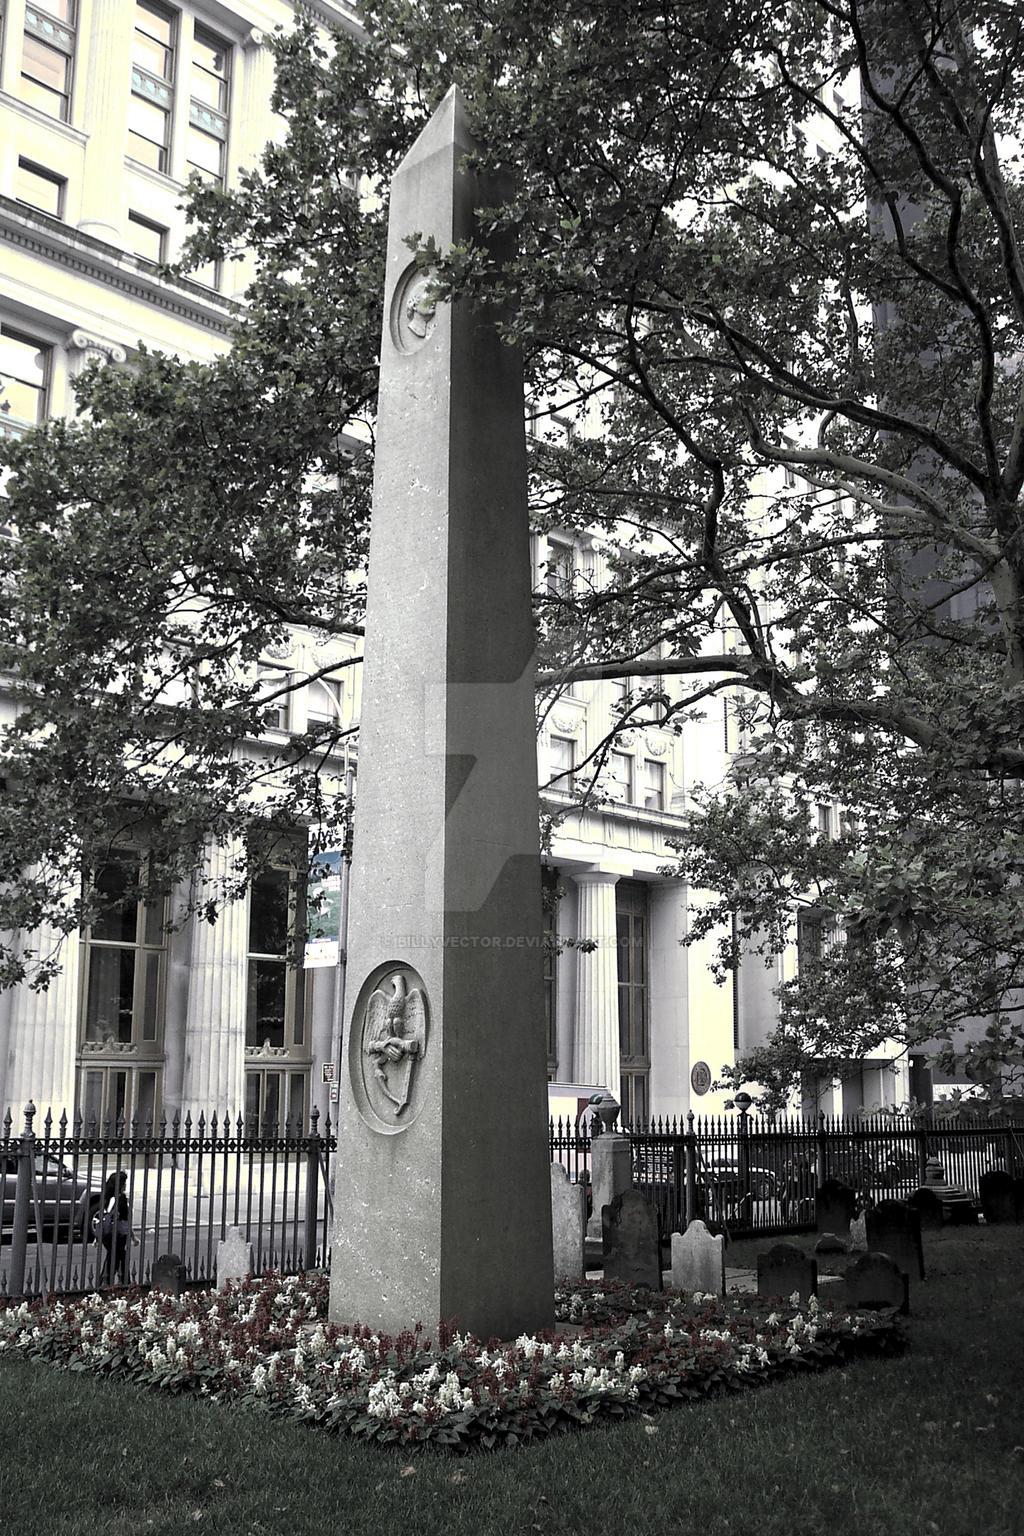 Ground Zero Obelisk by billyvector